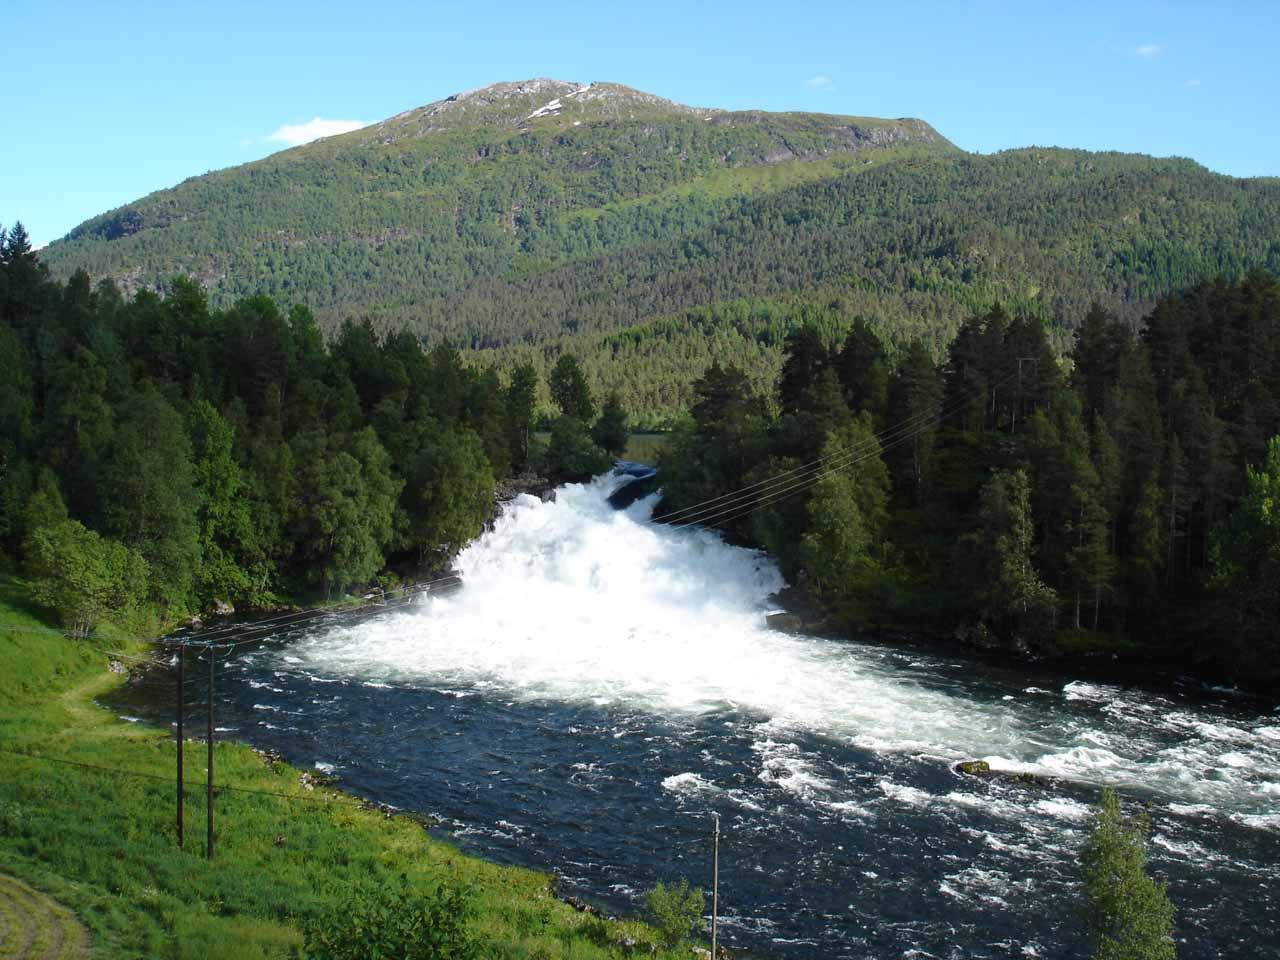 Some waterfall downstream of Eikjelandsfossen that I think is called Fossfossen